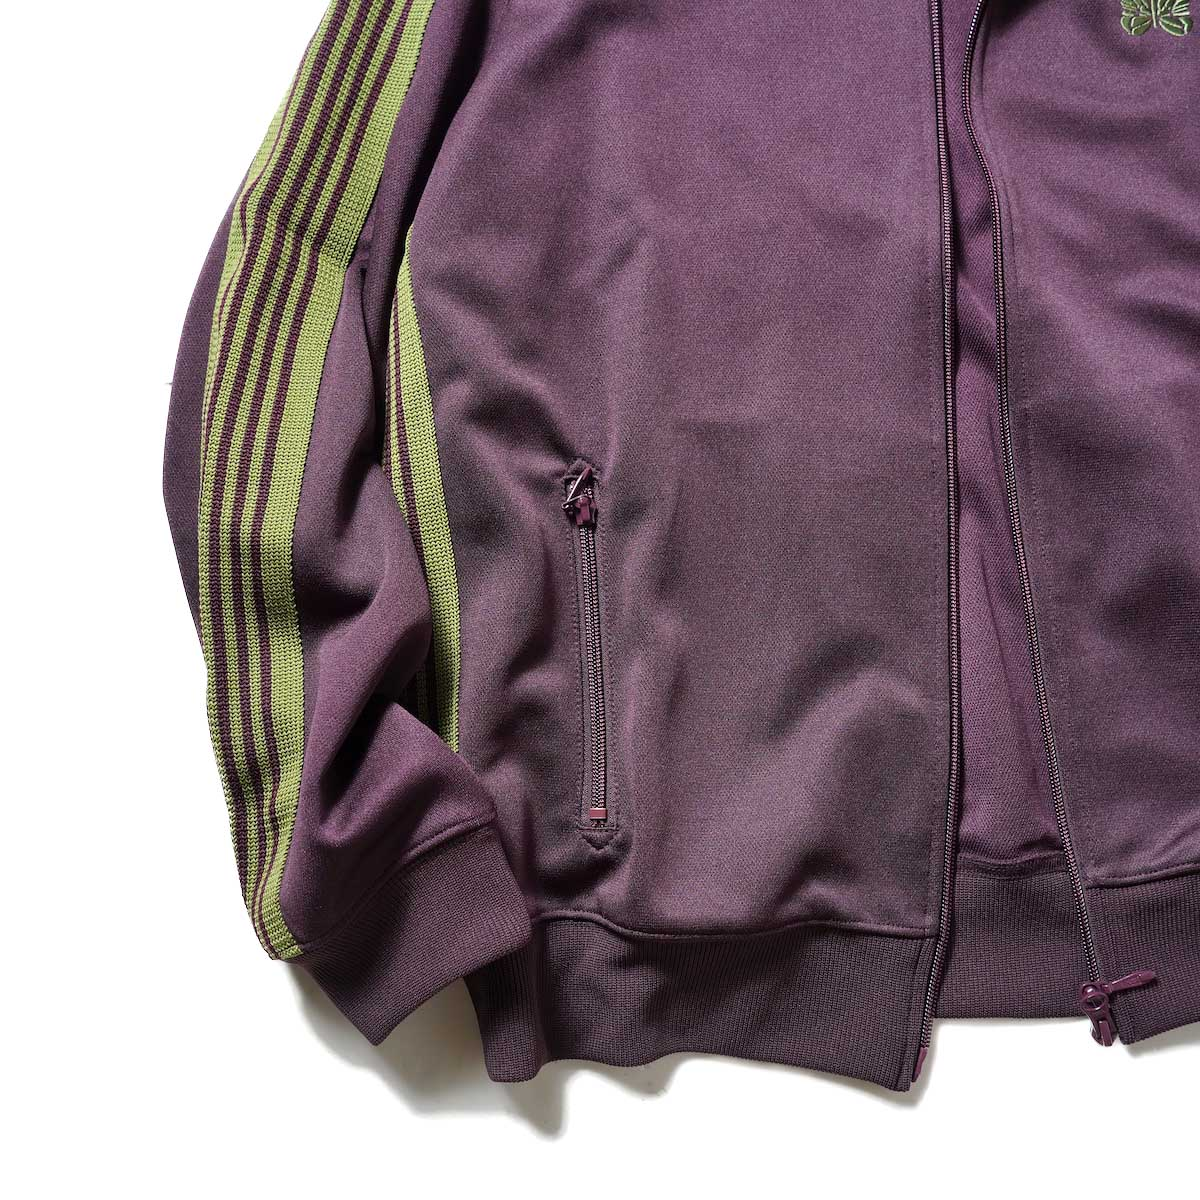 Needles / Track Jacket -Poly Smooth (Maroon)袖、裾